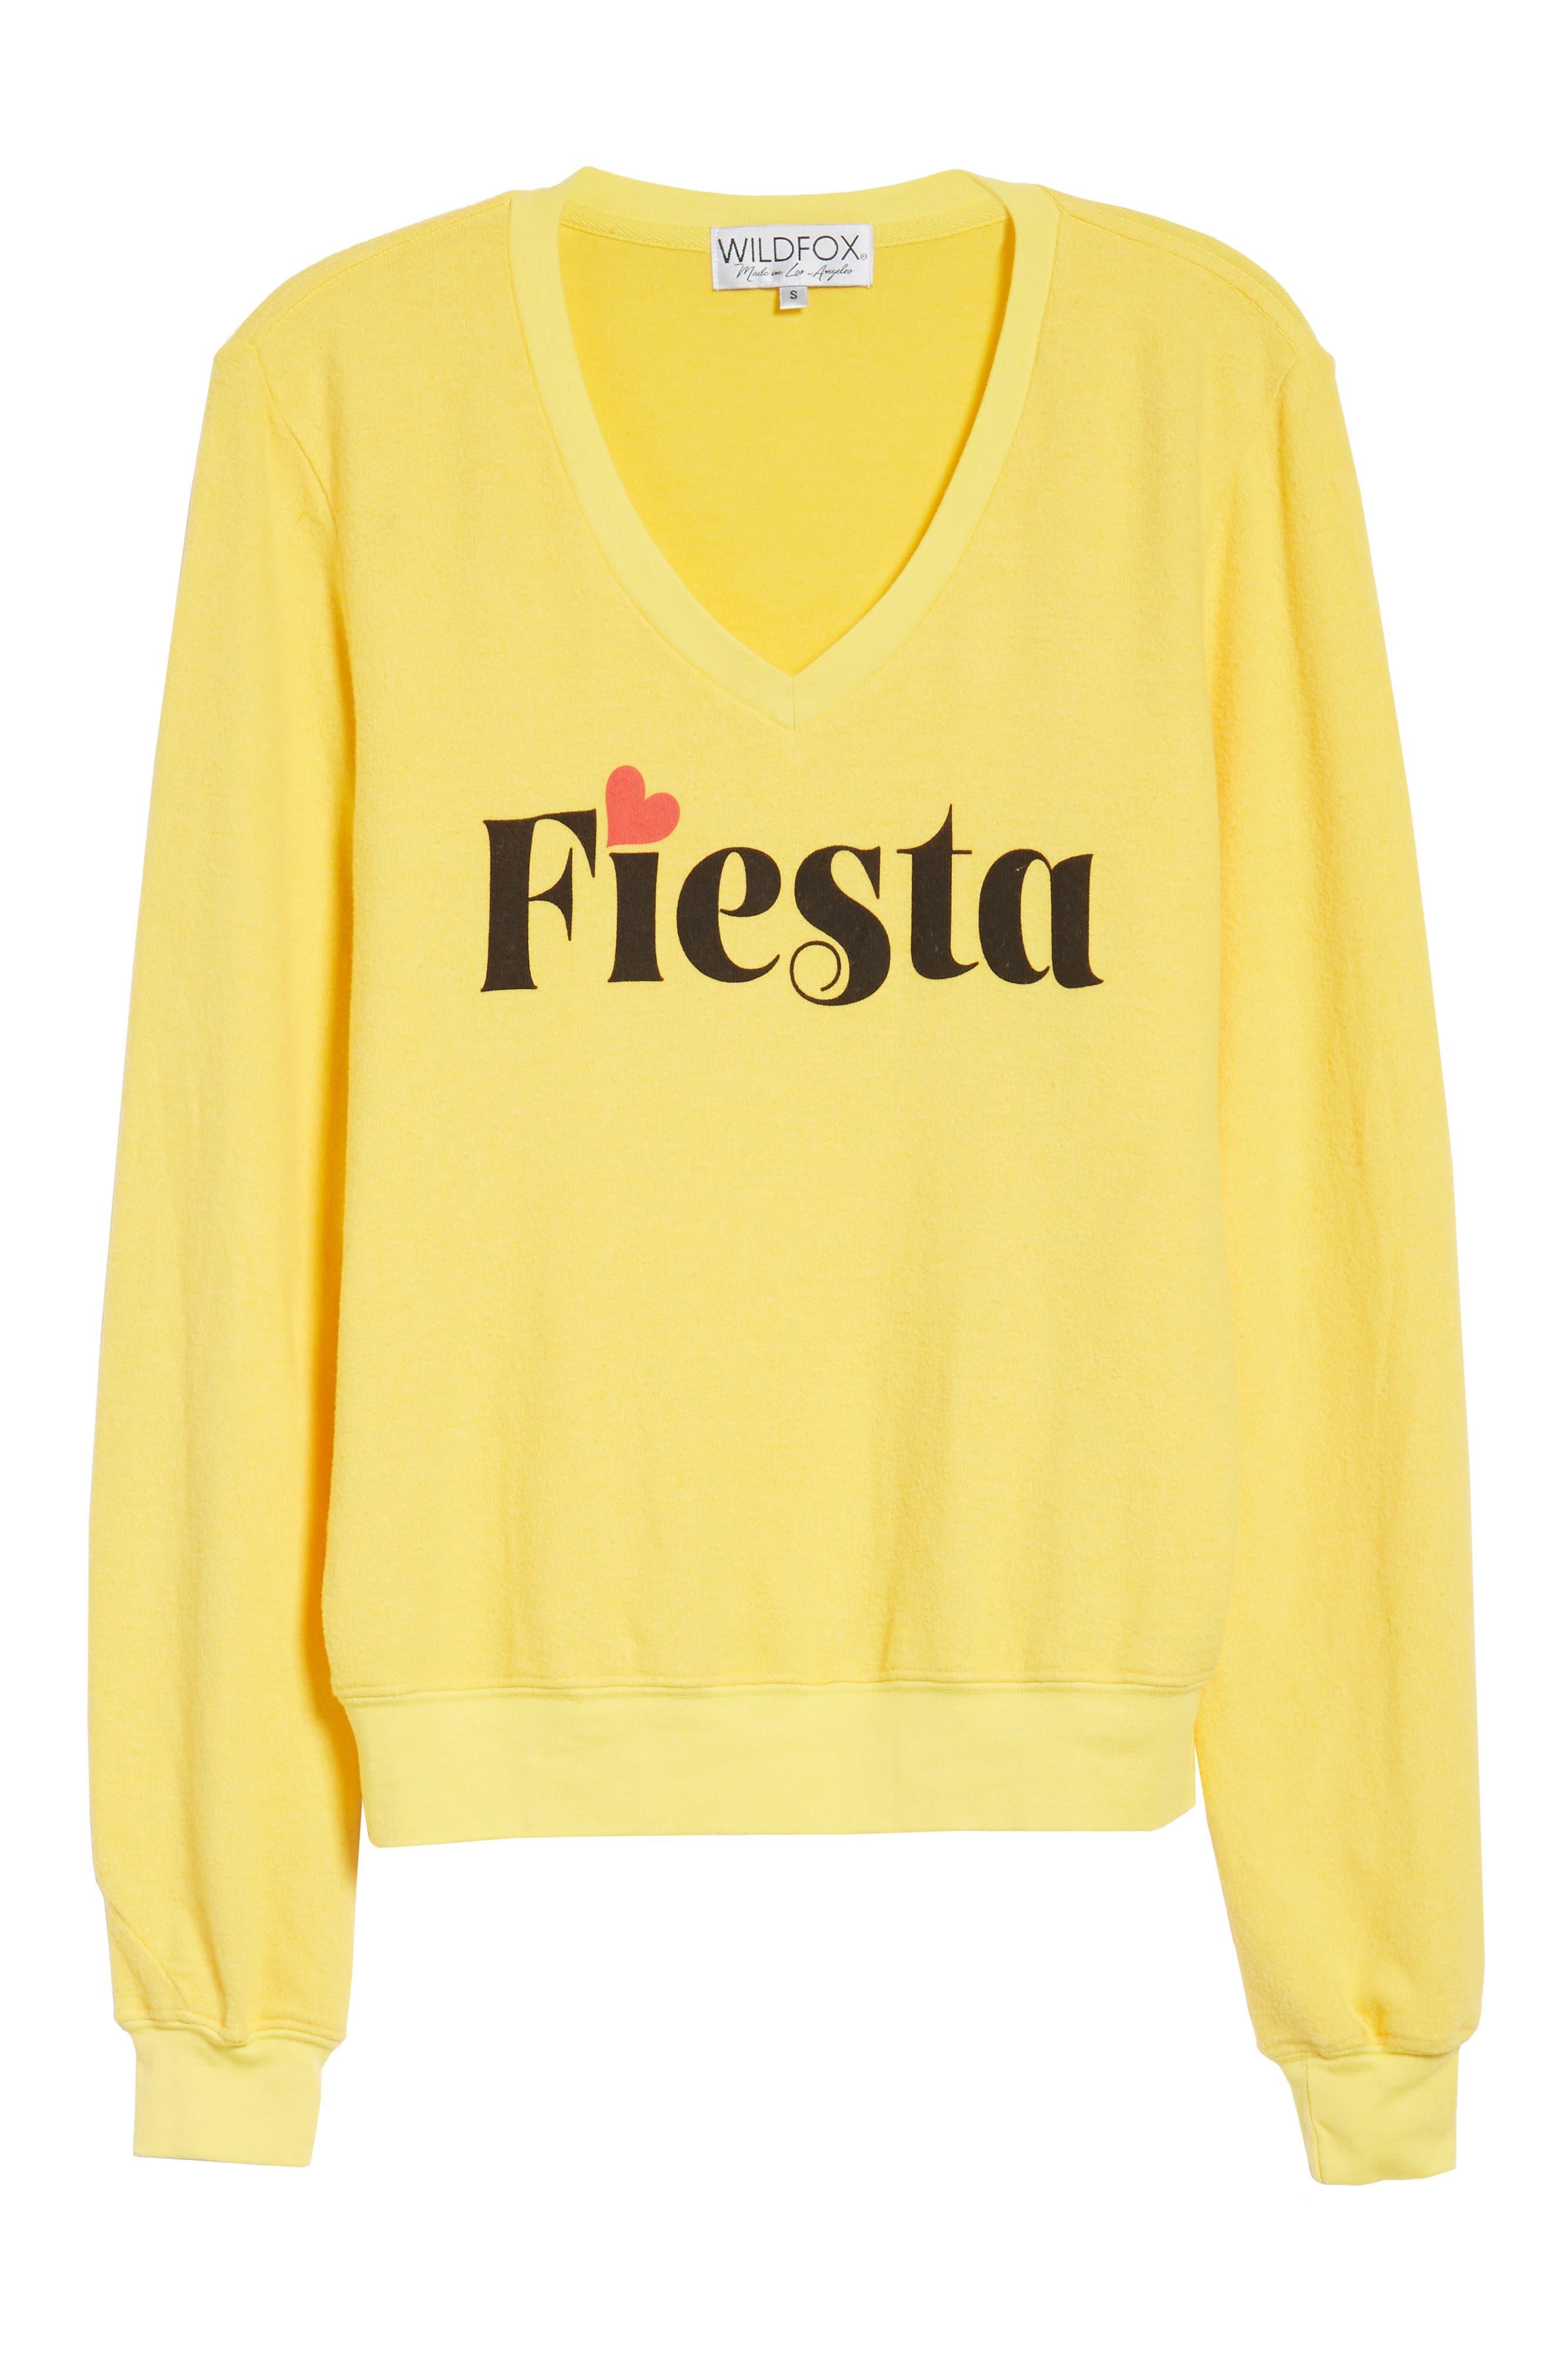 WILDFOX,                             Fiesta V-Neck Baggy Beach Pullover,                             Alternate thumbnail 7, color,                             750